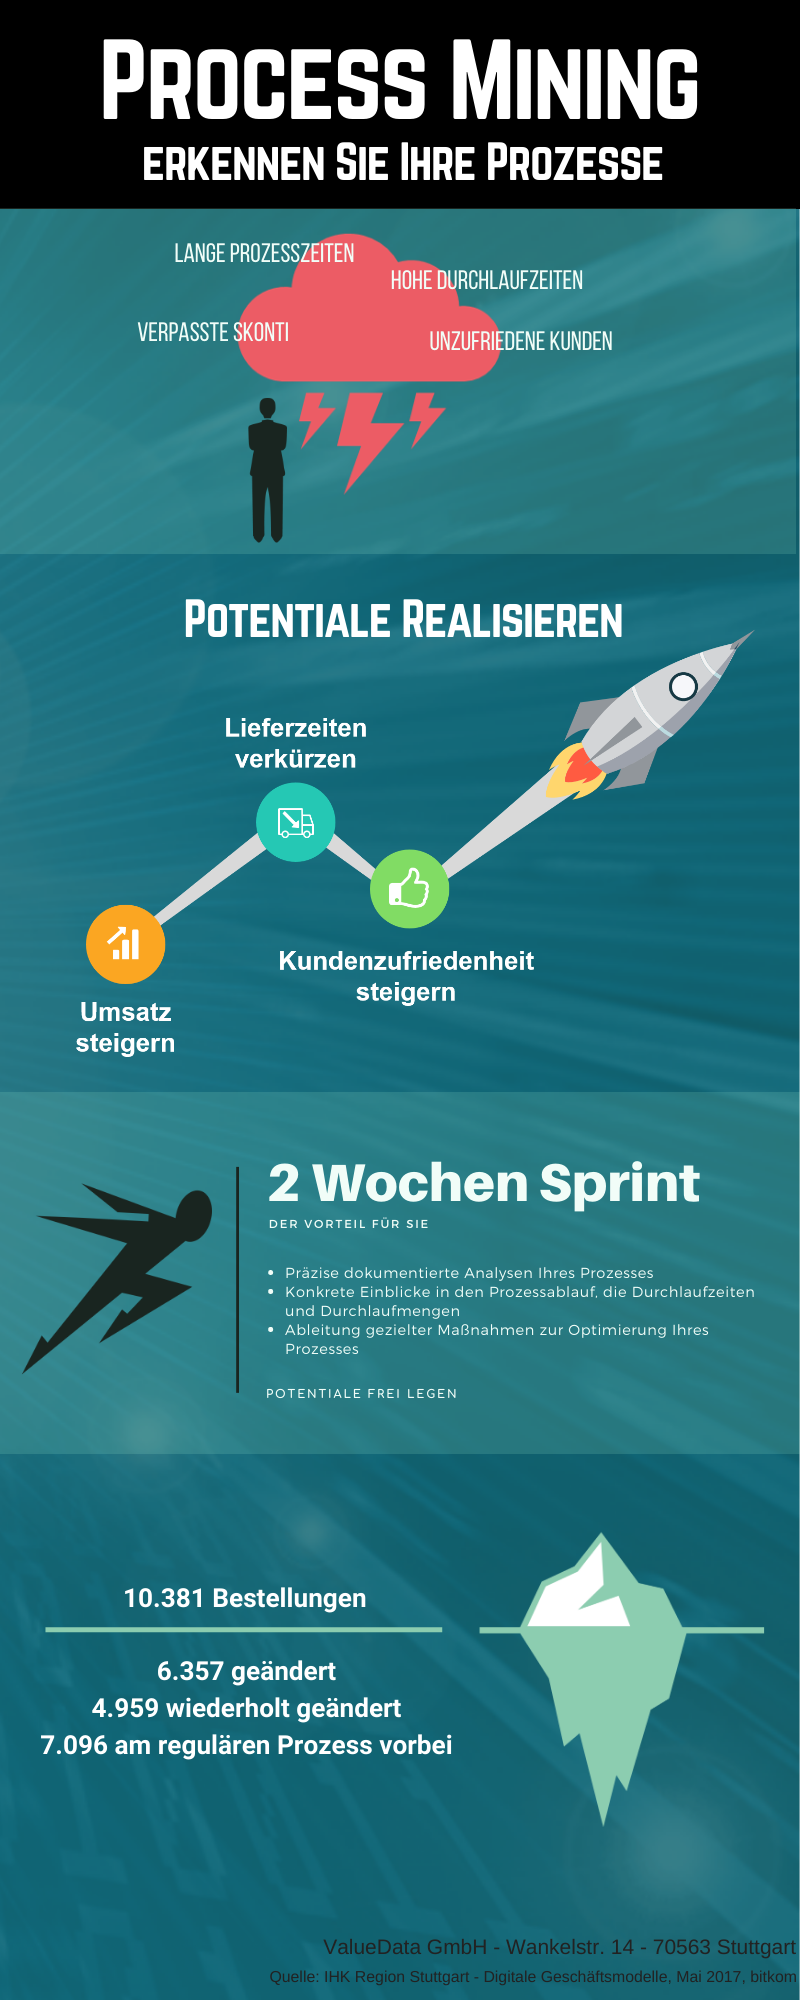 Process Mining Sprints